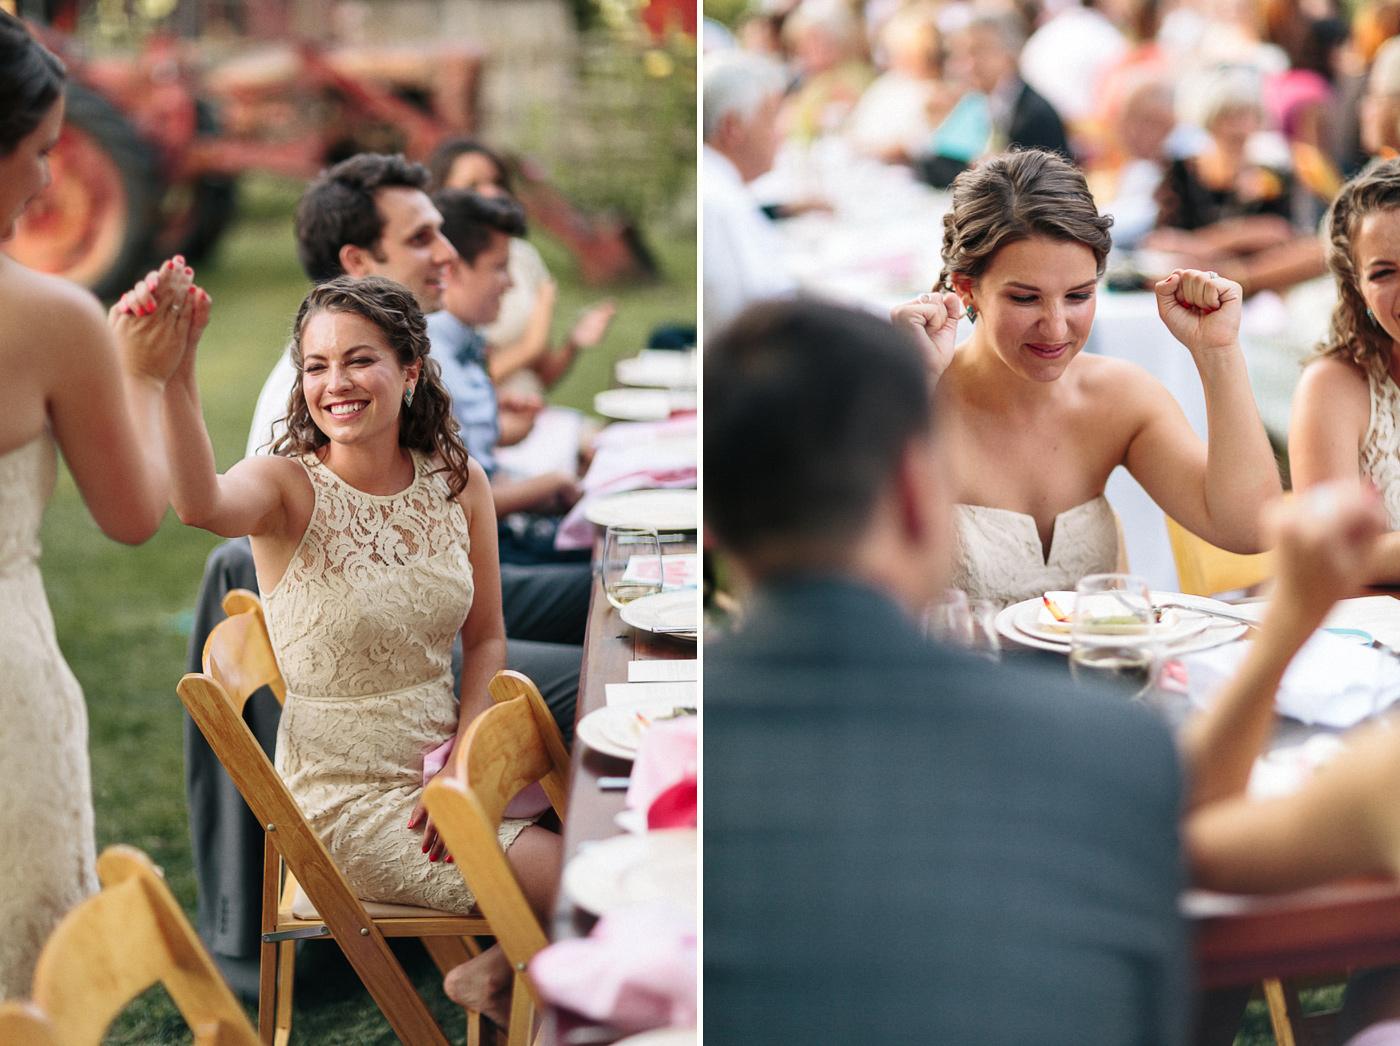 Lyons-Farmette-Wedding-Photographer-Lucy-Austin-Flash-Mob-Dance-57.jpg